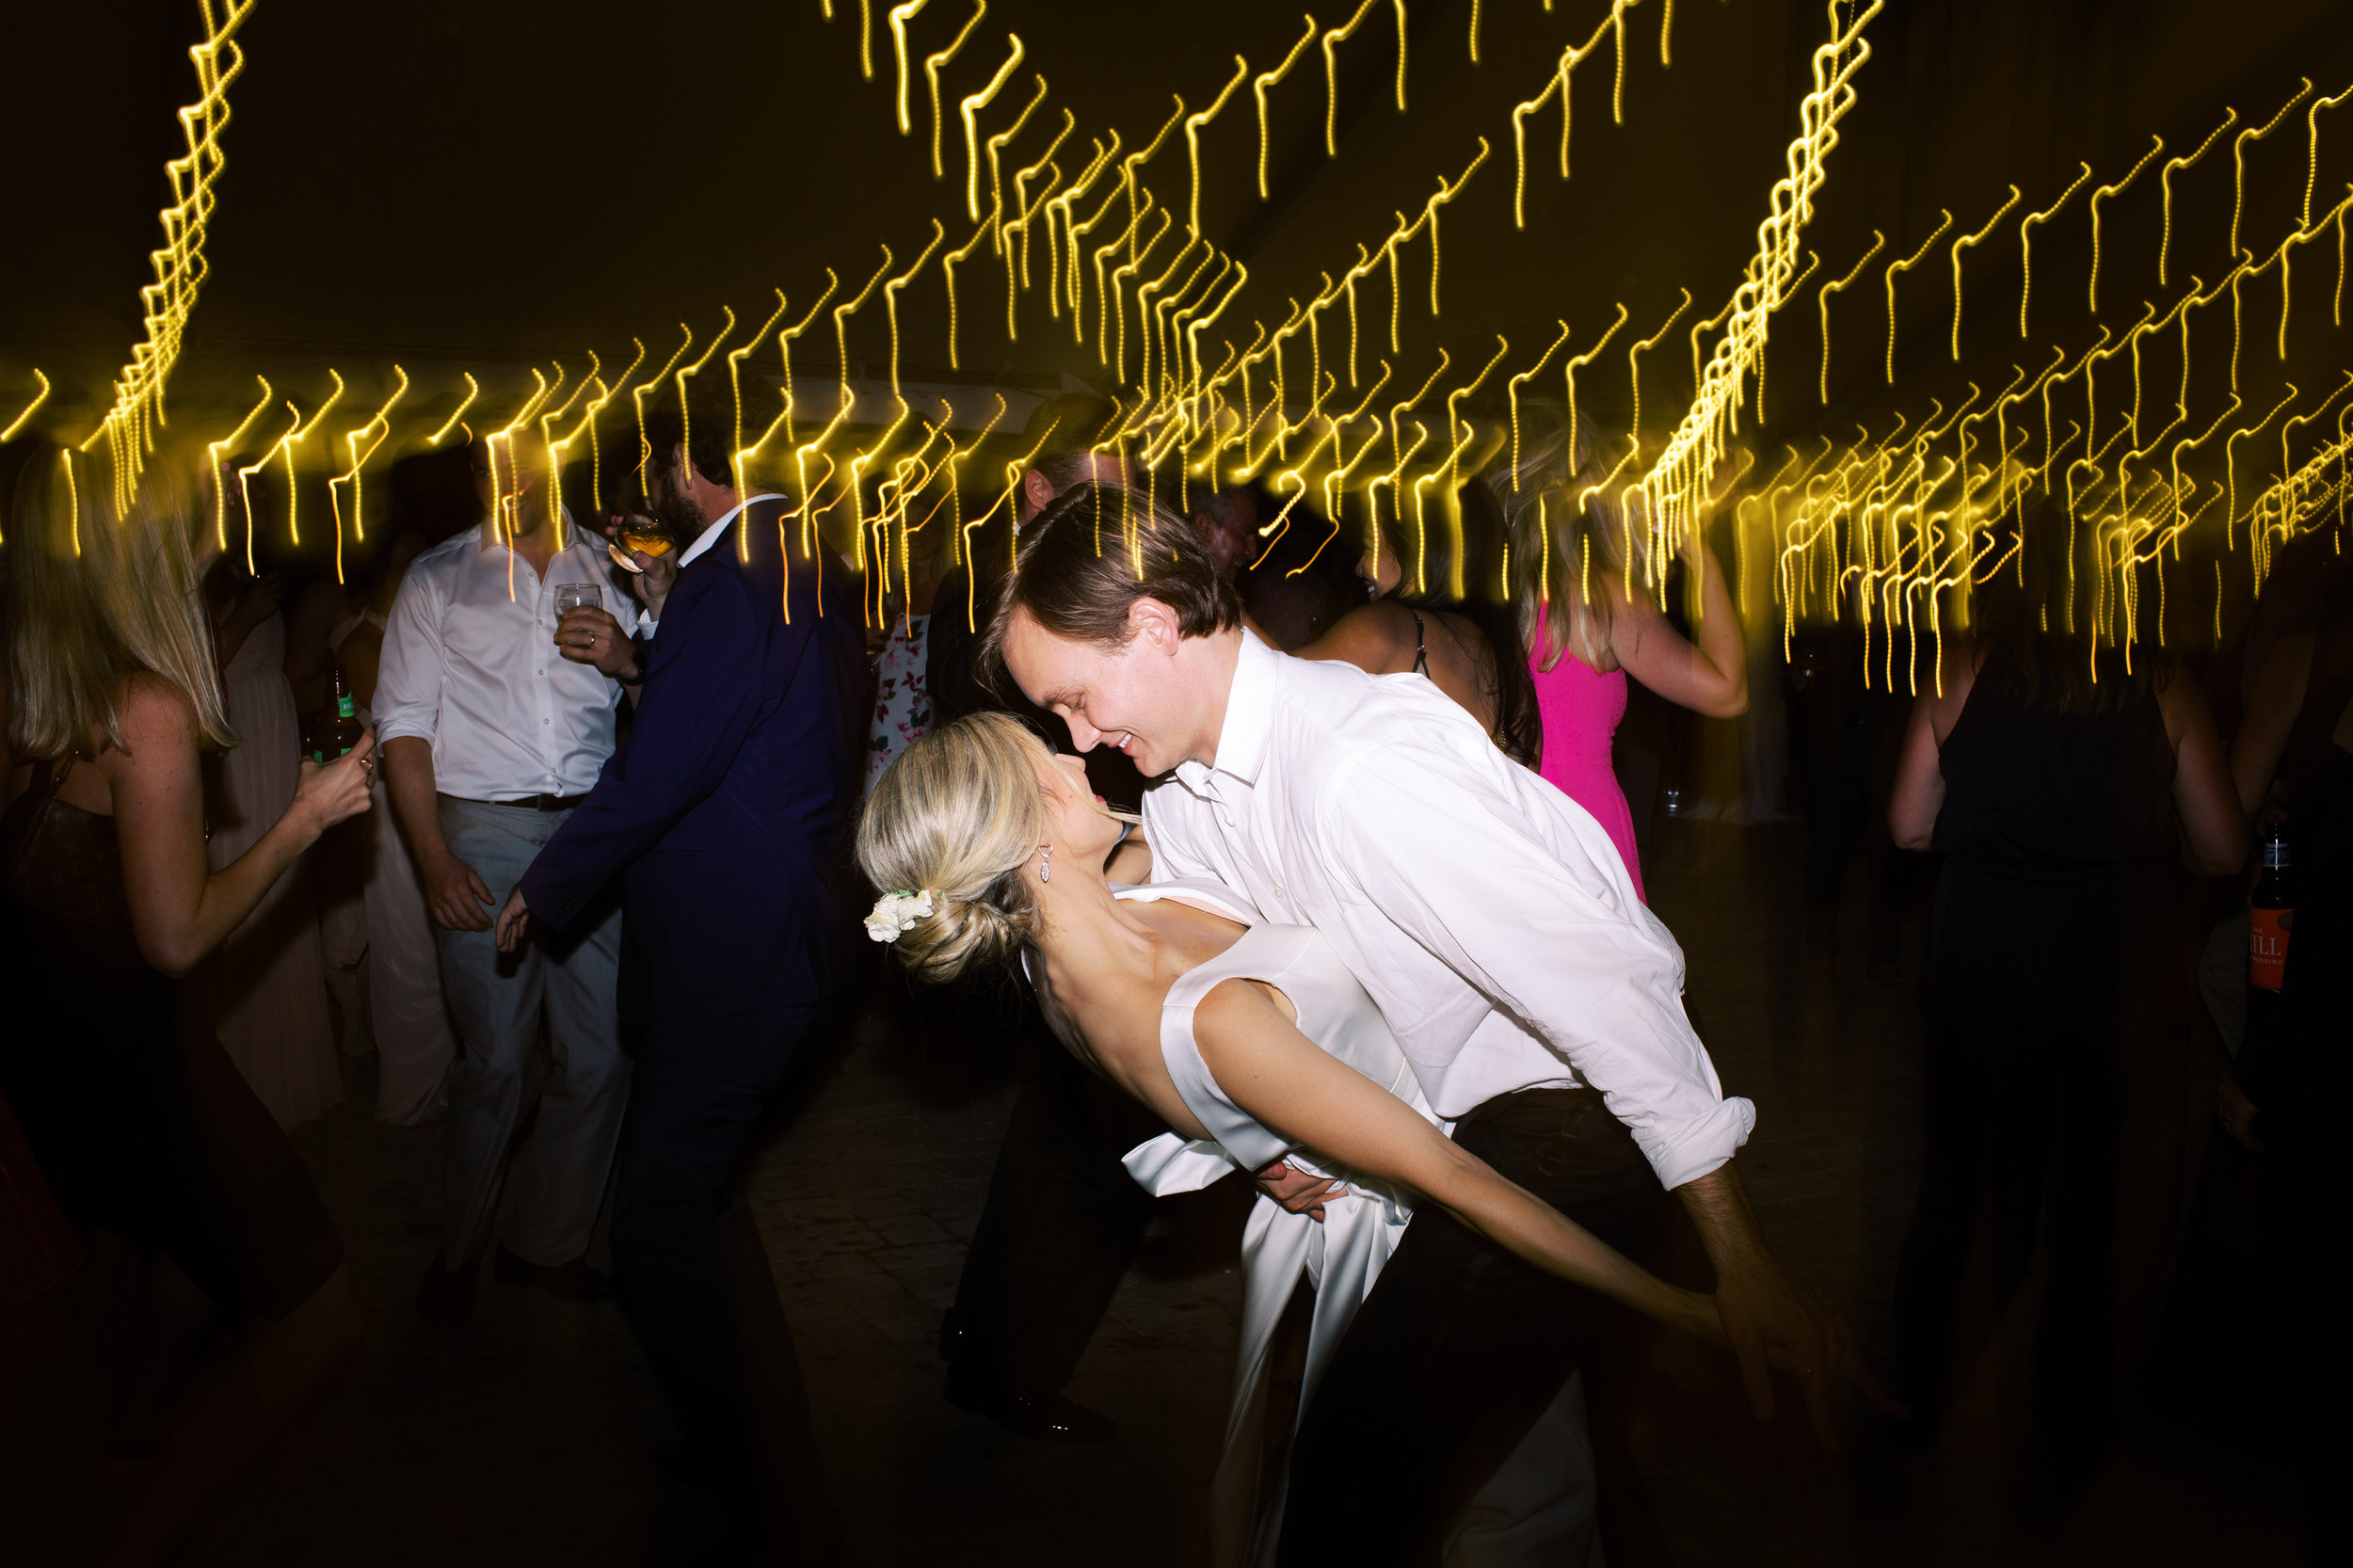 Olivia_Patrick_Wedding_Quarry_Venue_Abigail_Malone_Photography_Knoxville-913.jpg